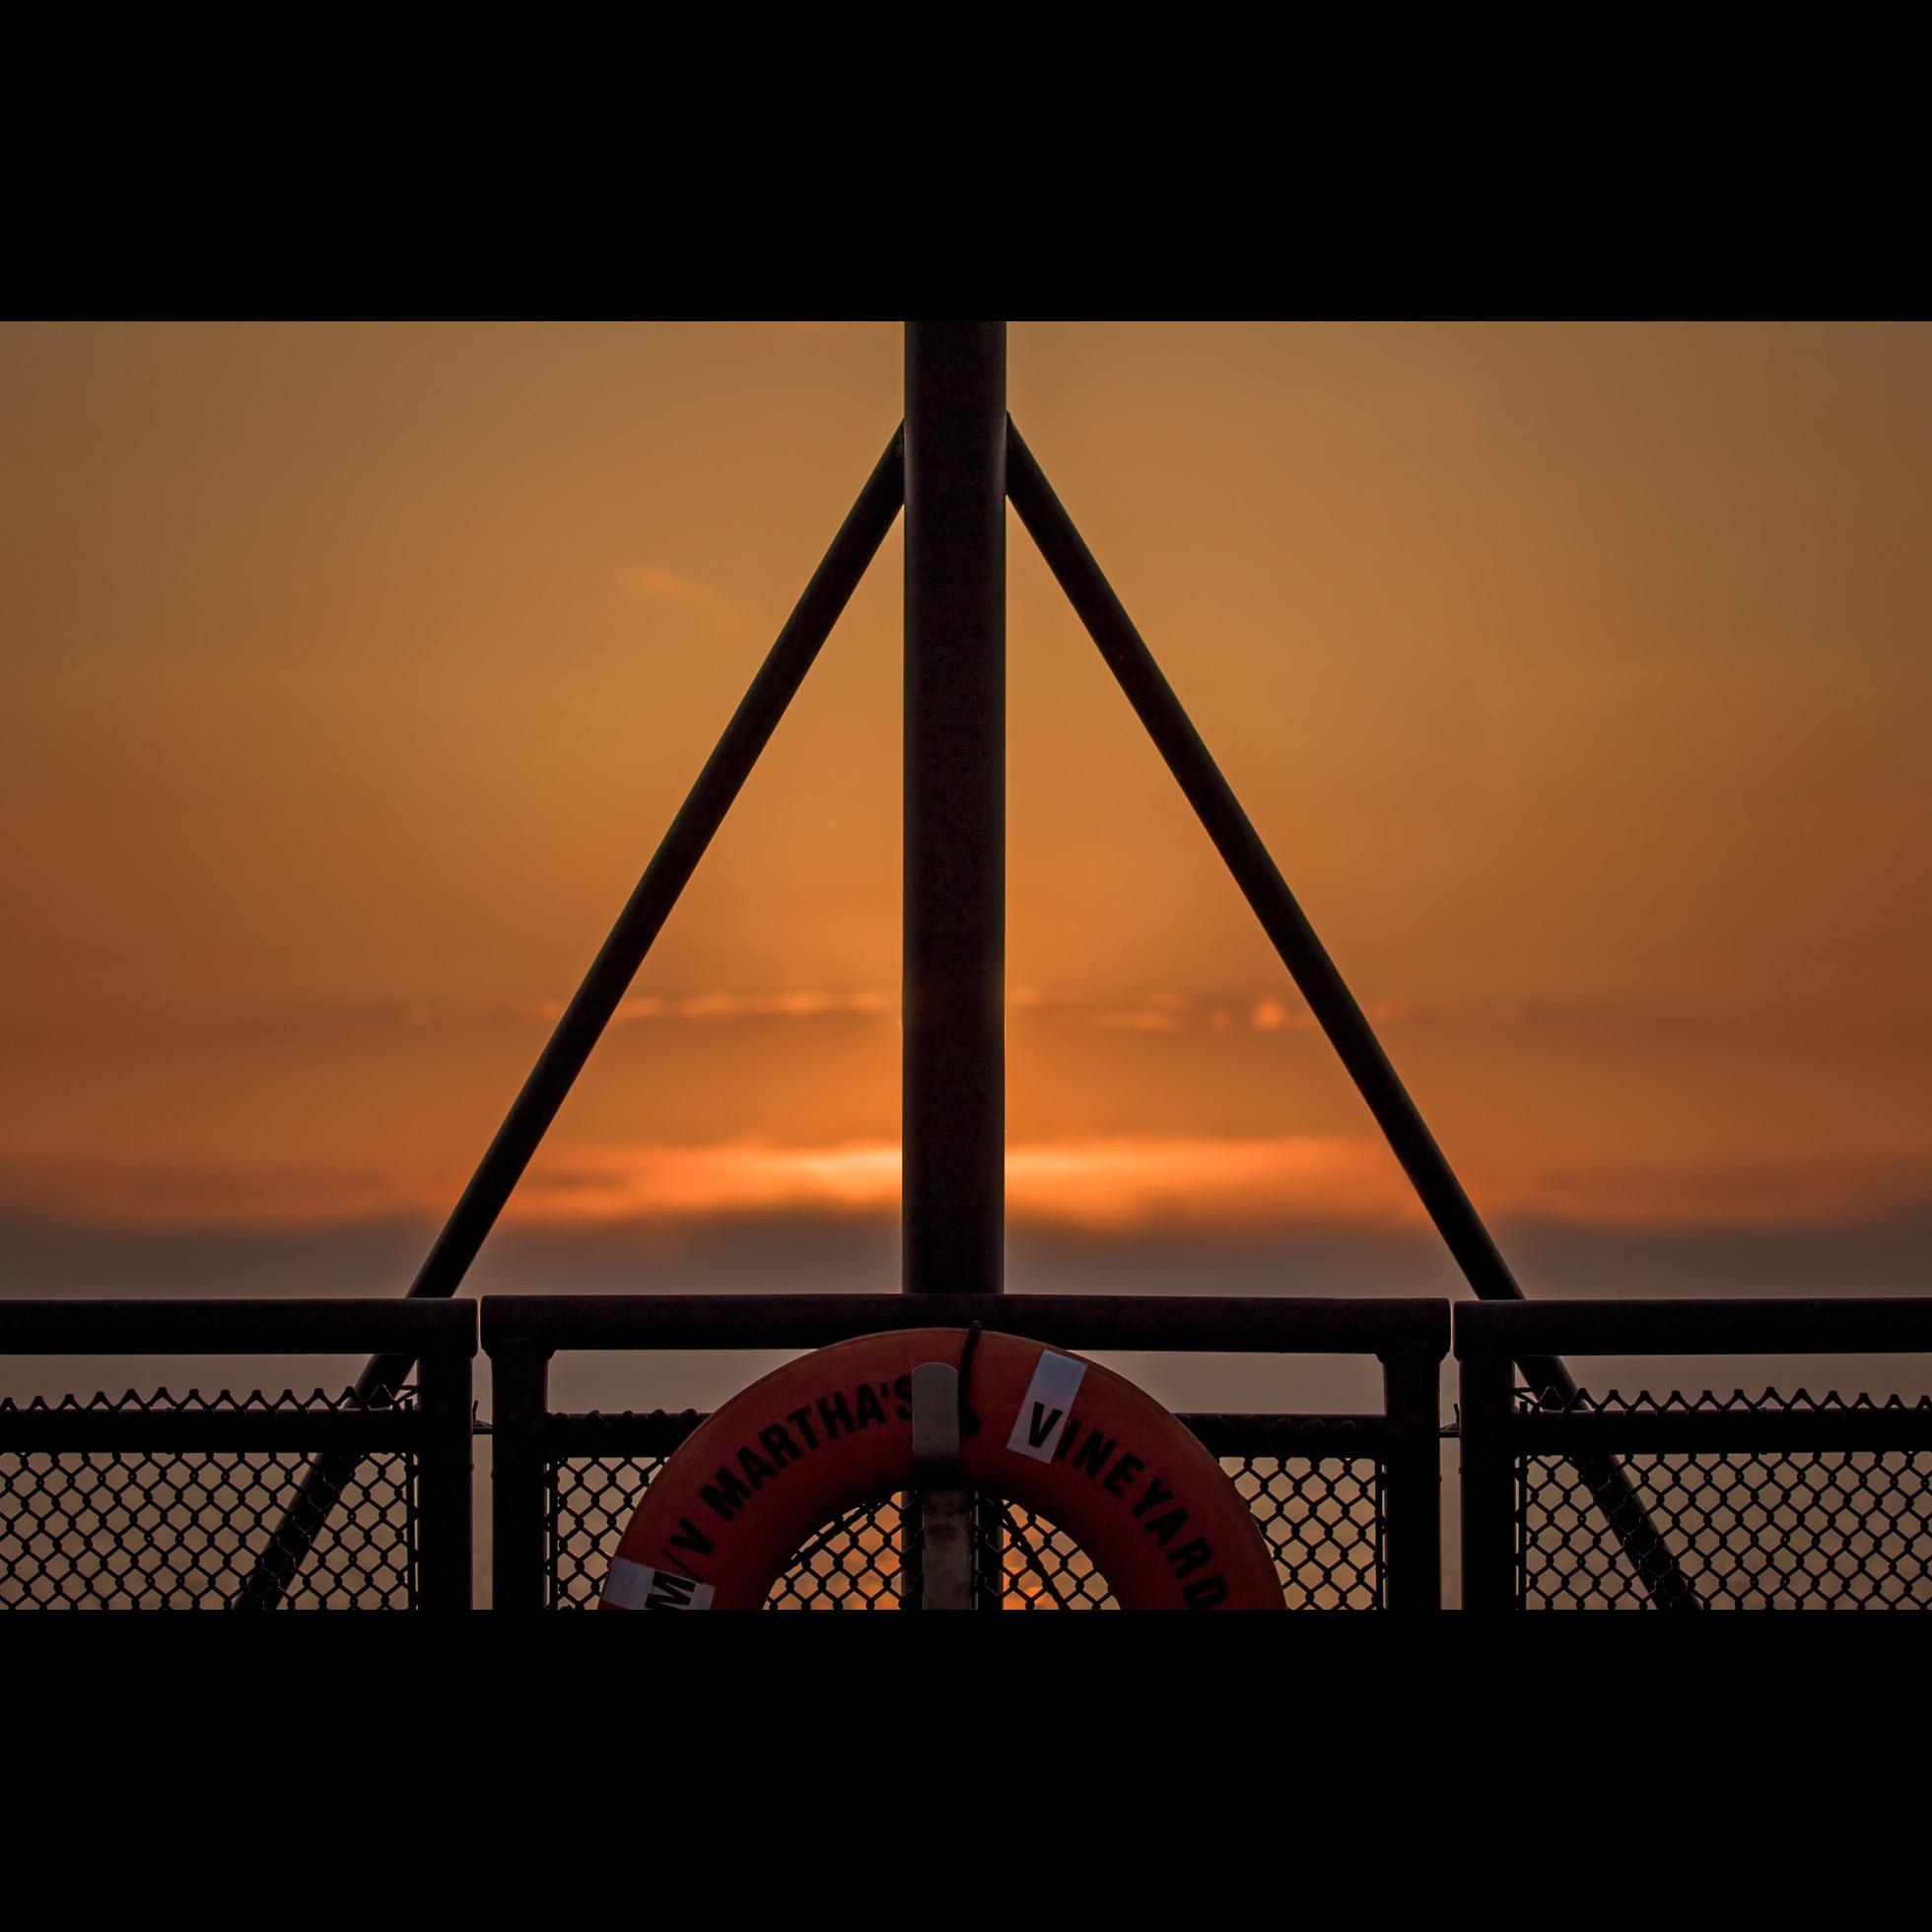 6.29 MV MARTHA'S VINEYARD